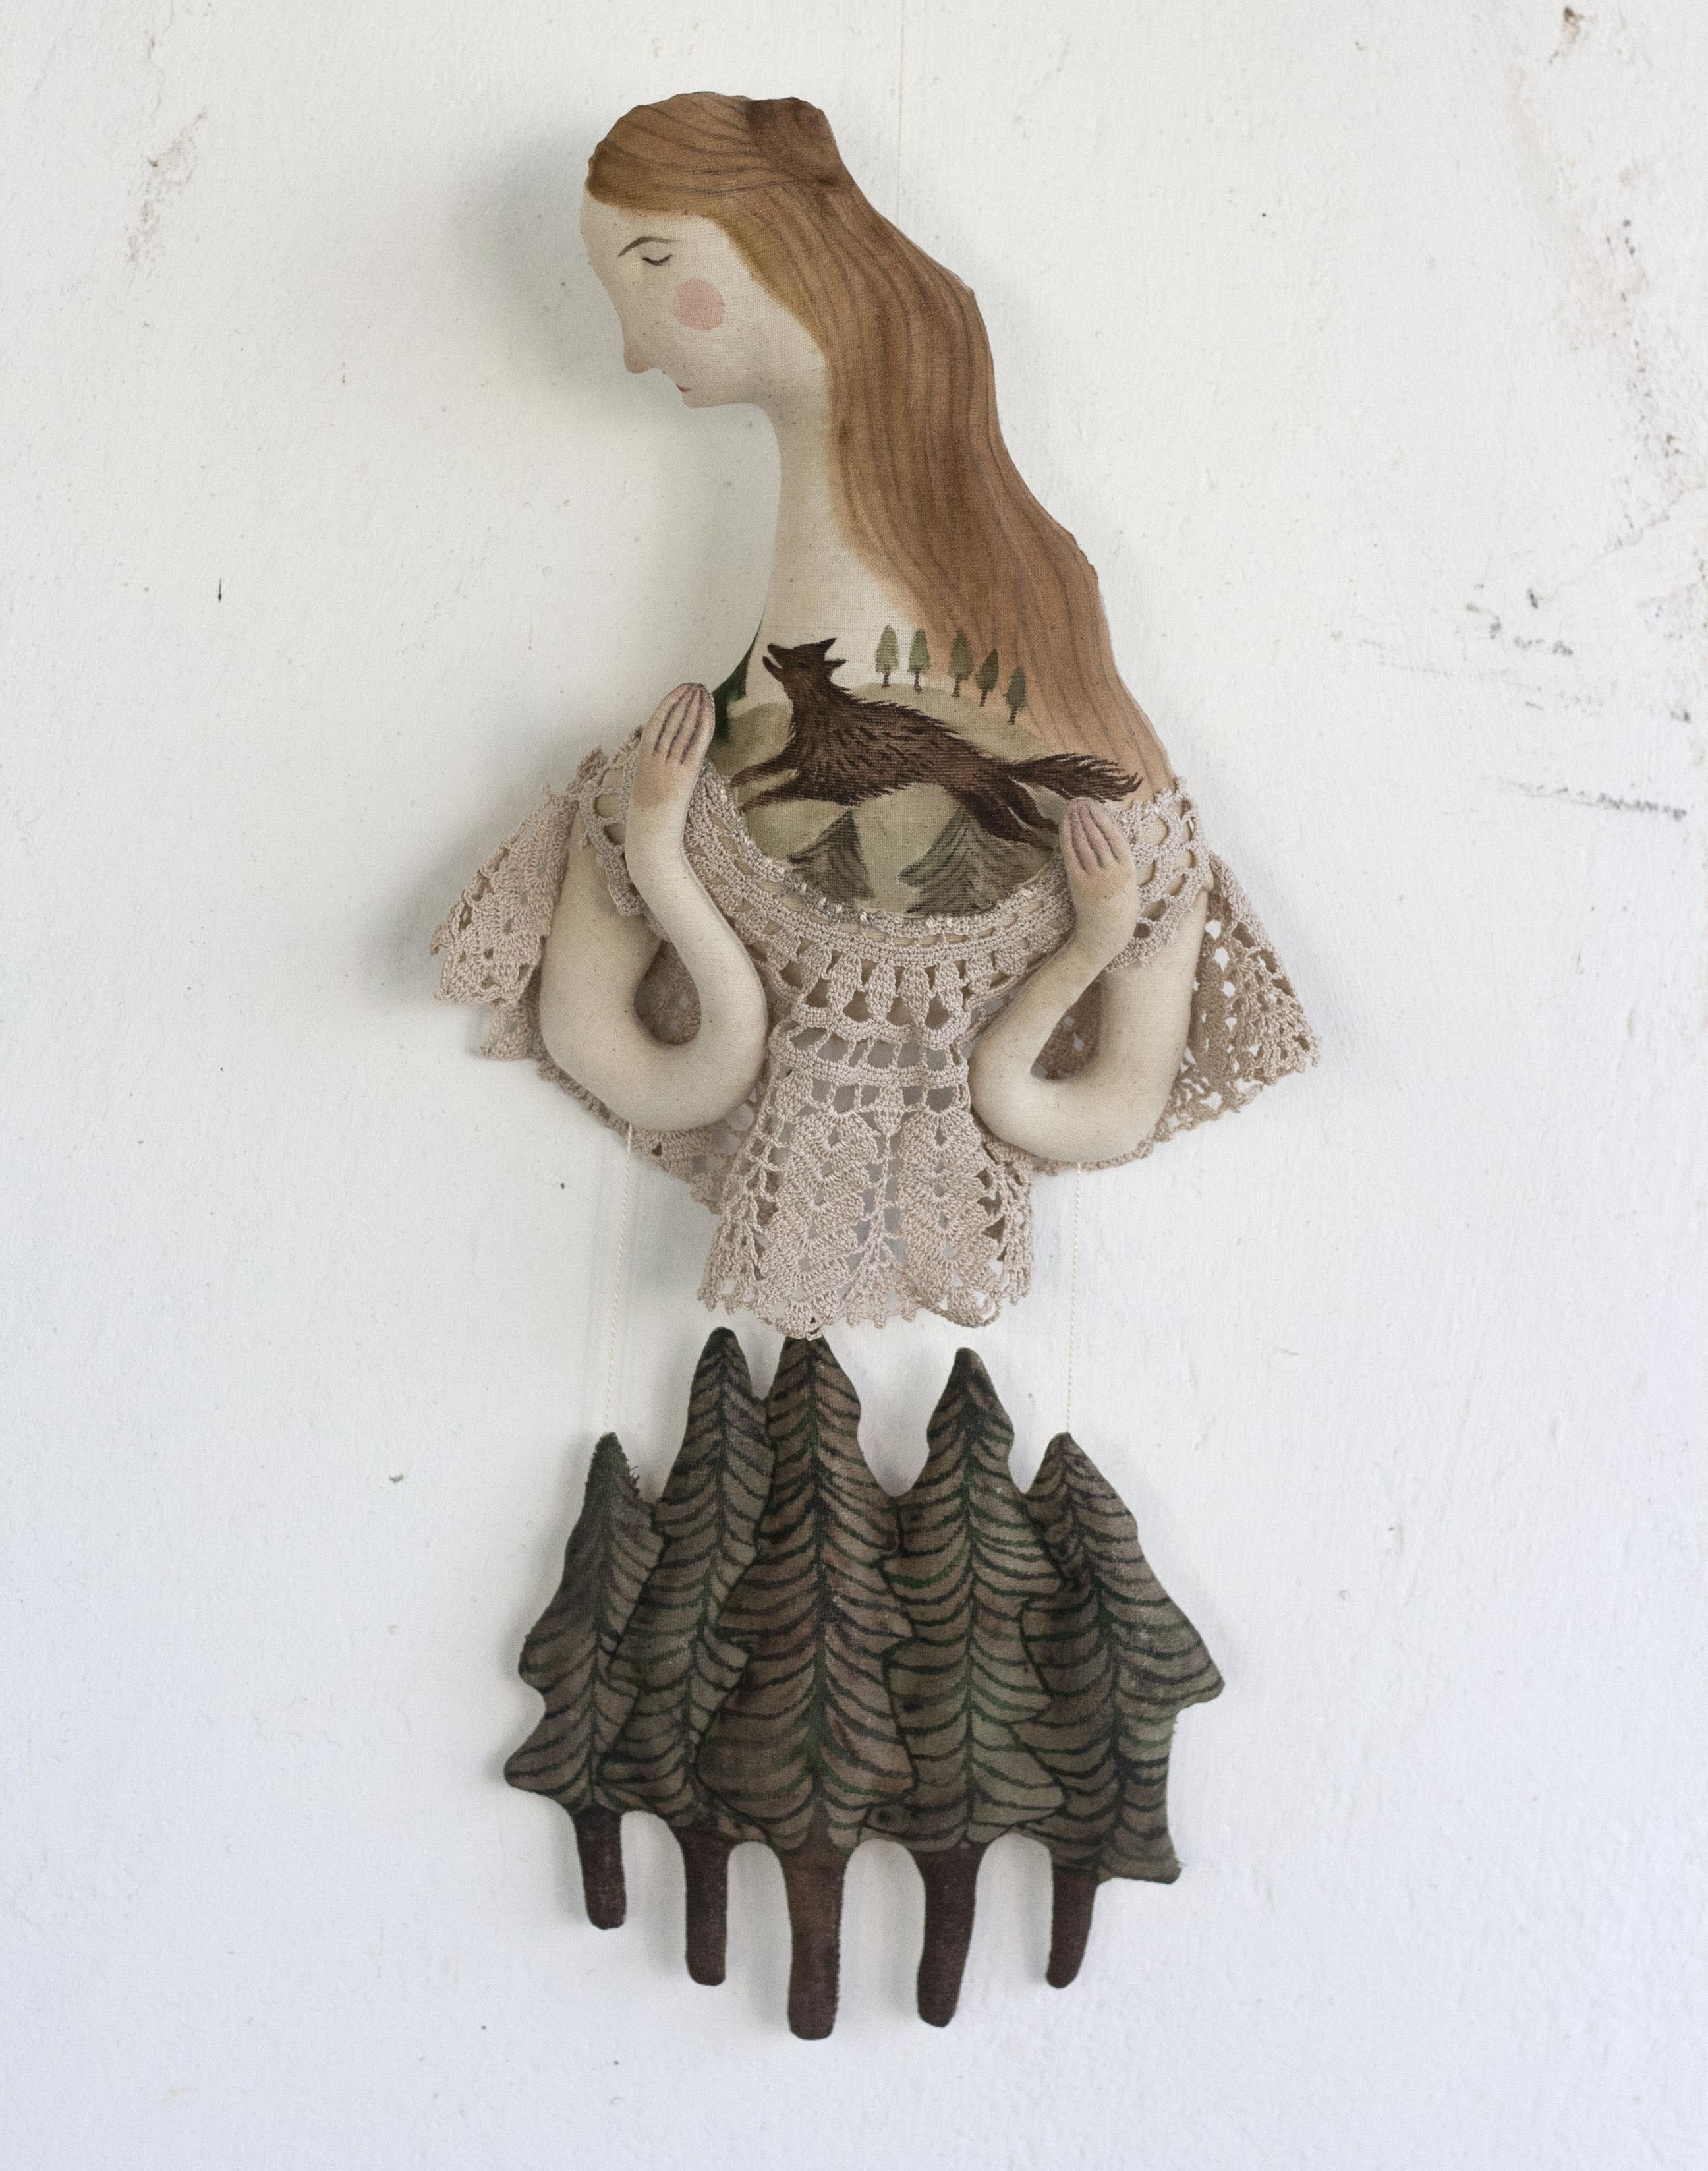 art dolls and textile art